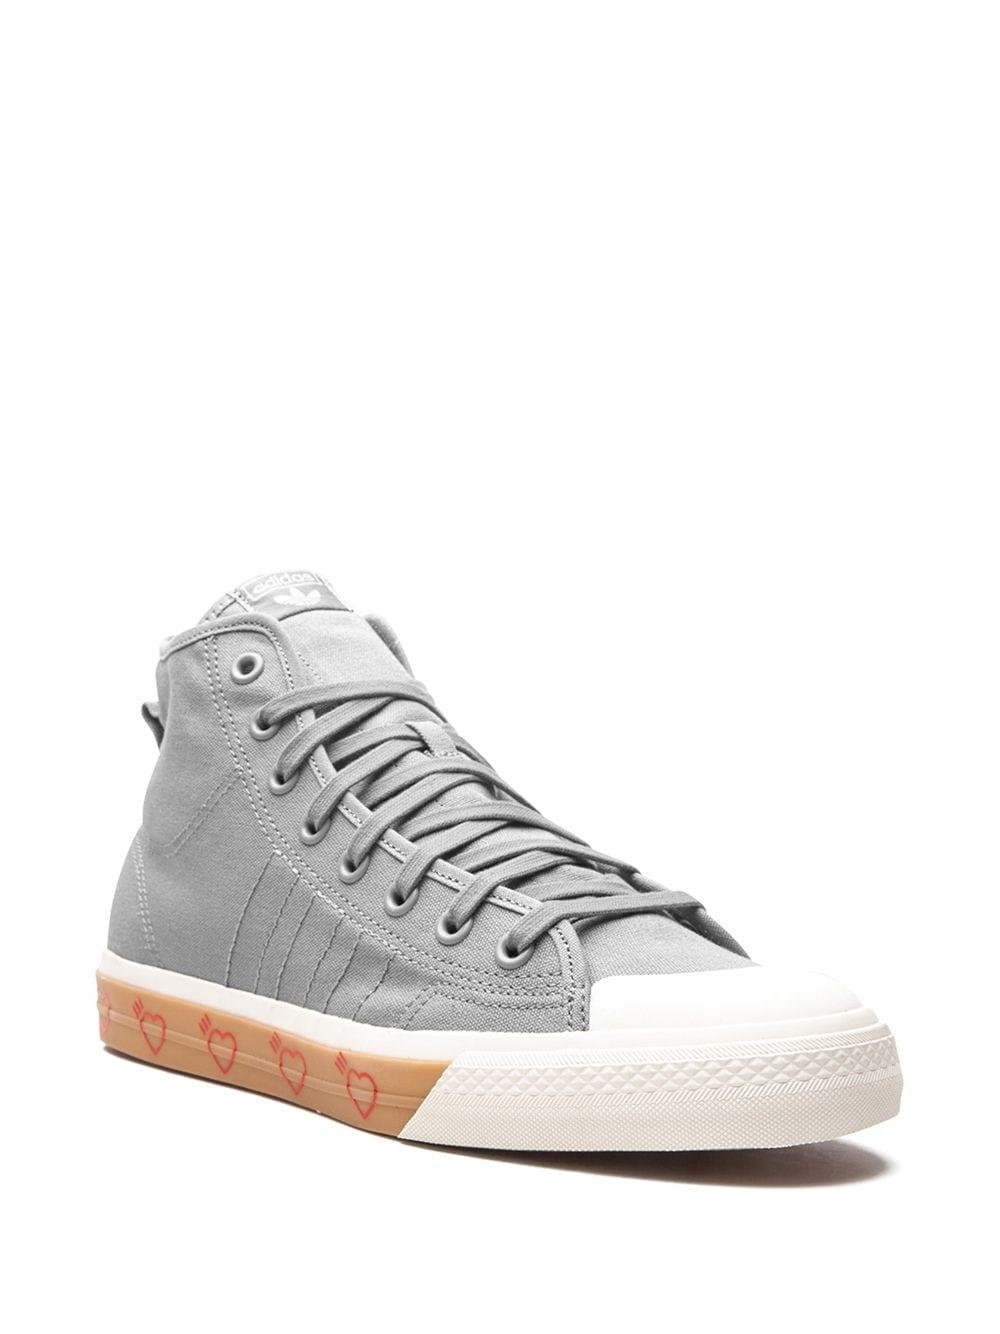 Кроссвоки adidas Nizza Hi Human Made Grey Five